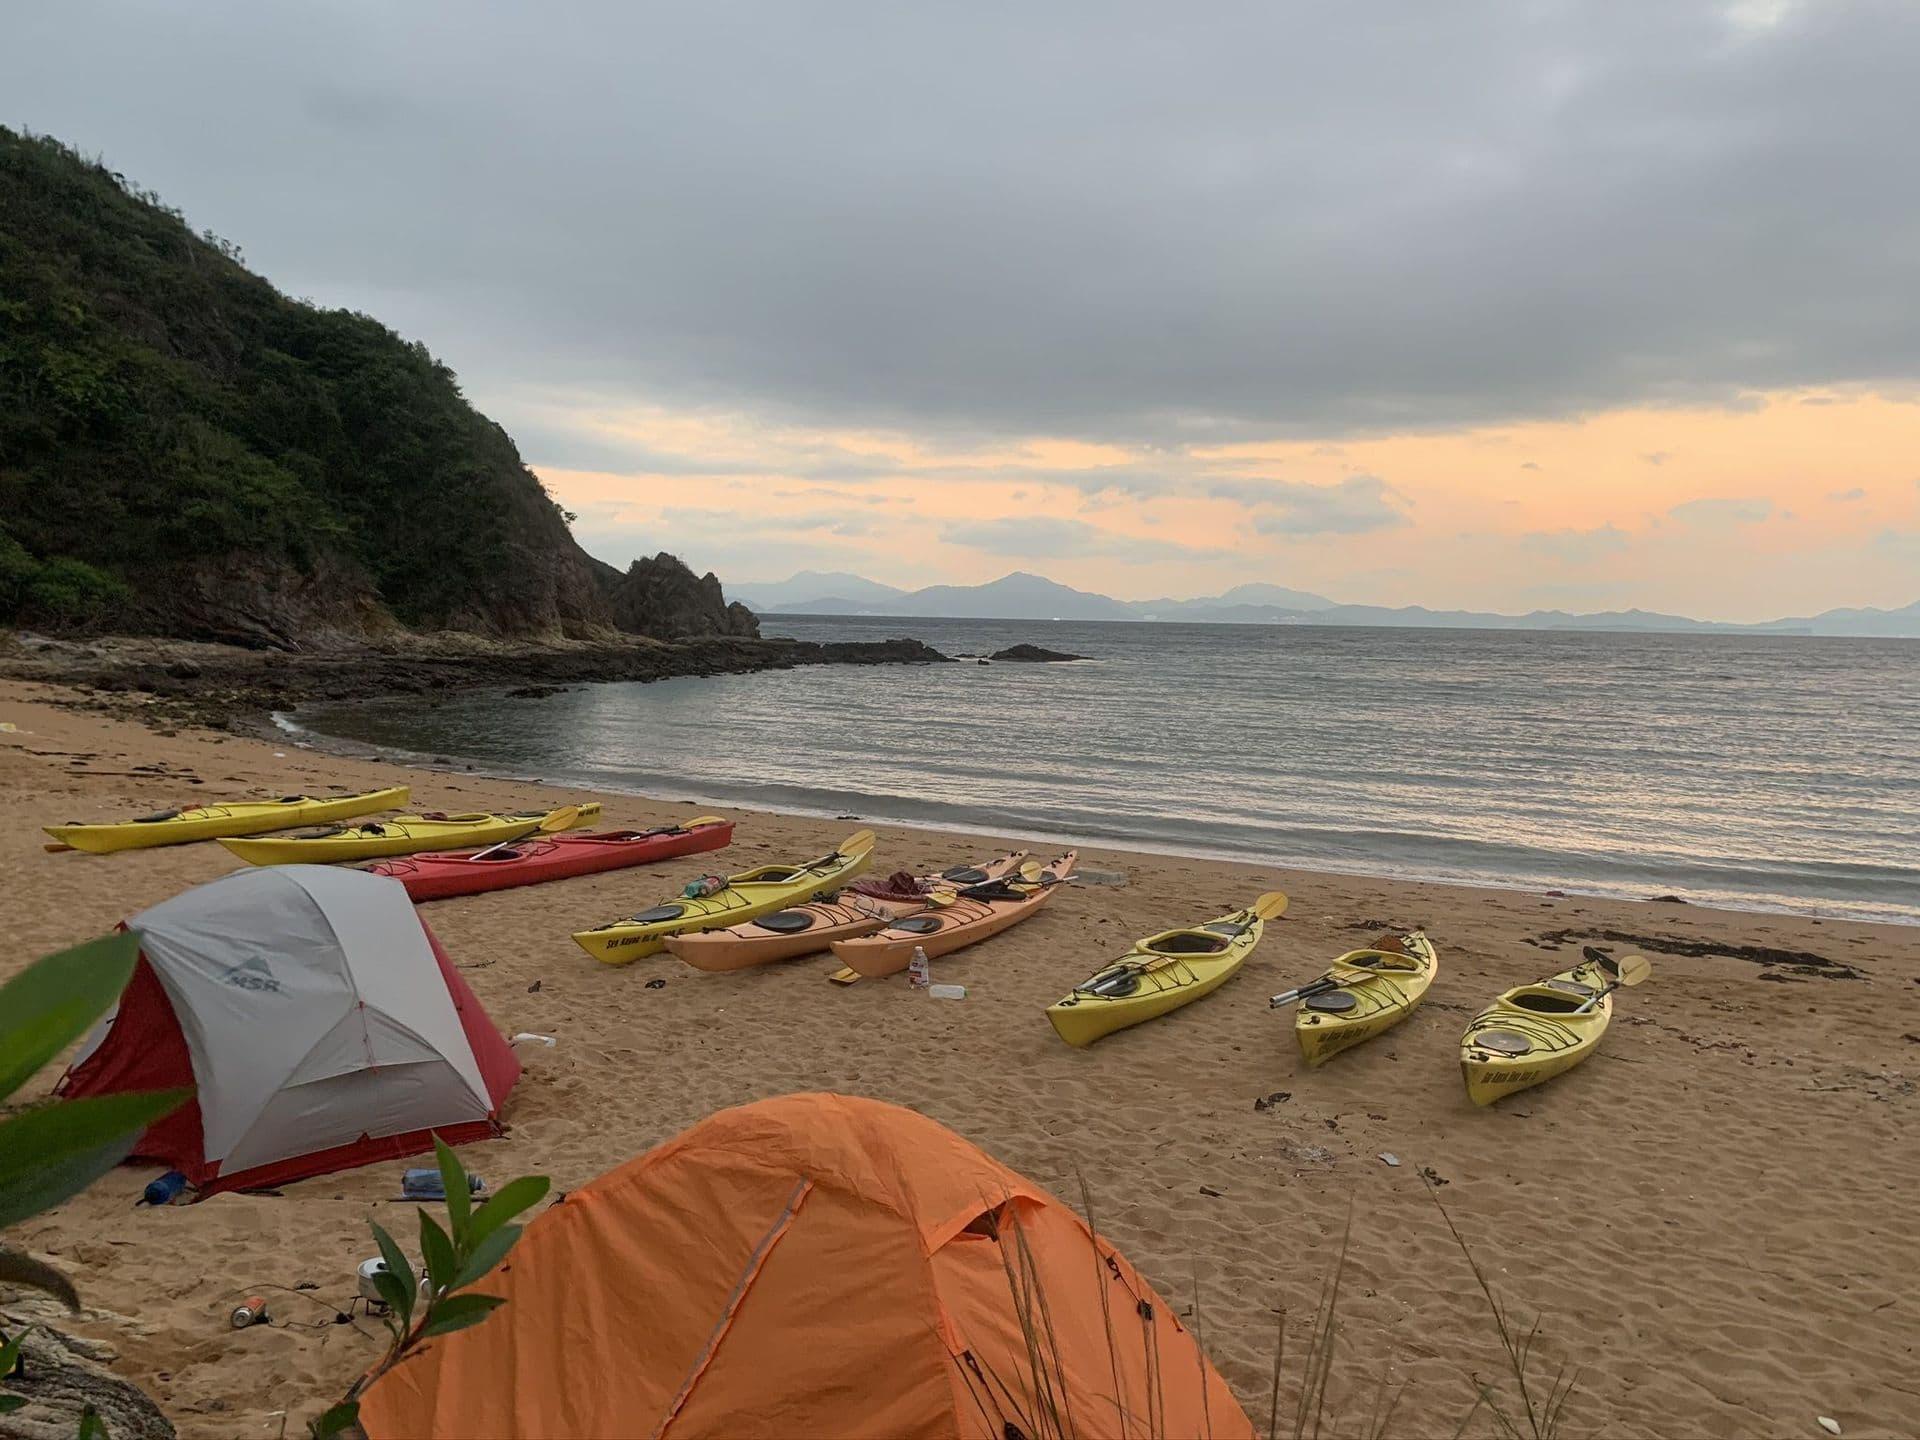 Double Haven Sea Kayak Camping Trip